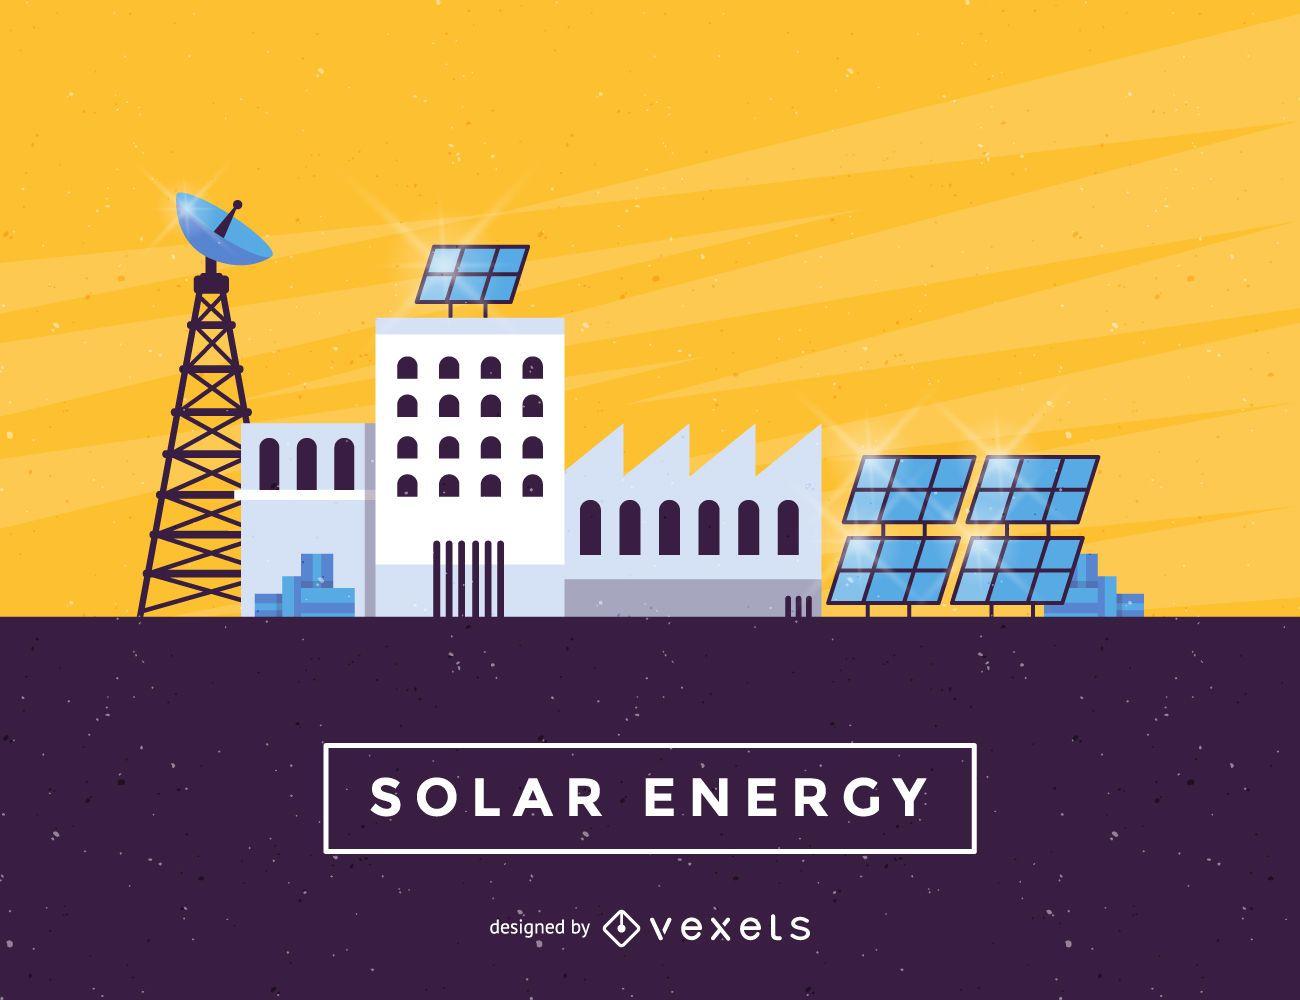 Solar Energy panels industry illustration